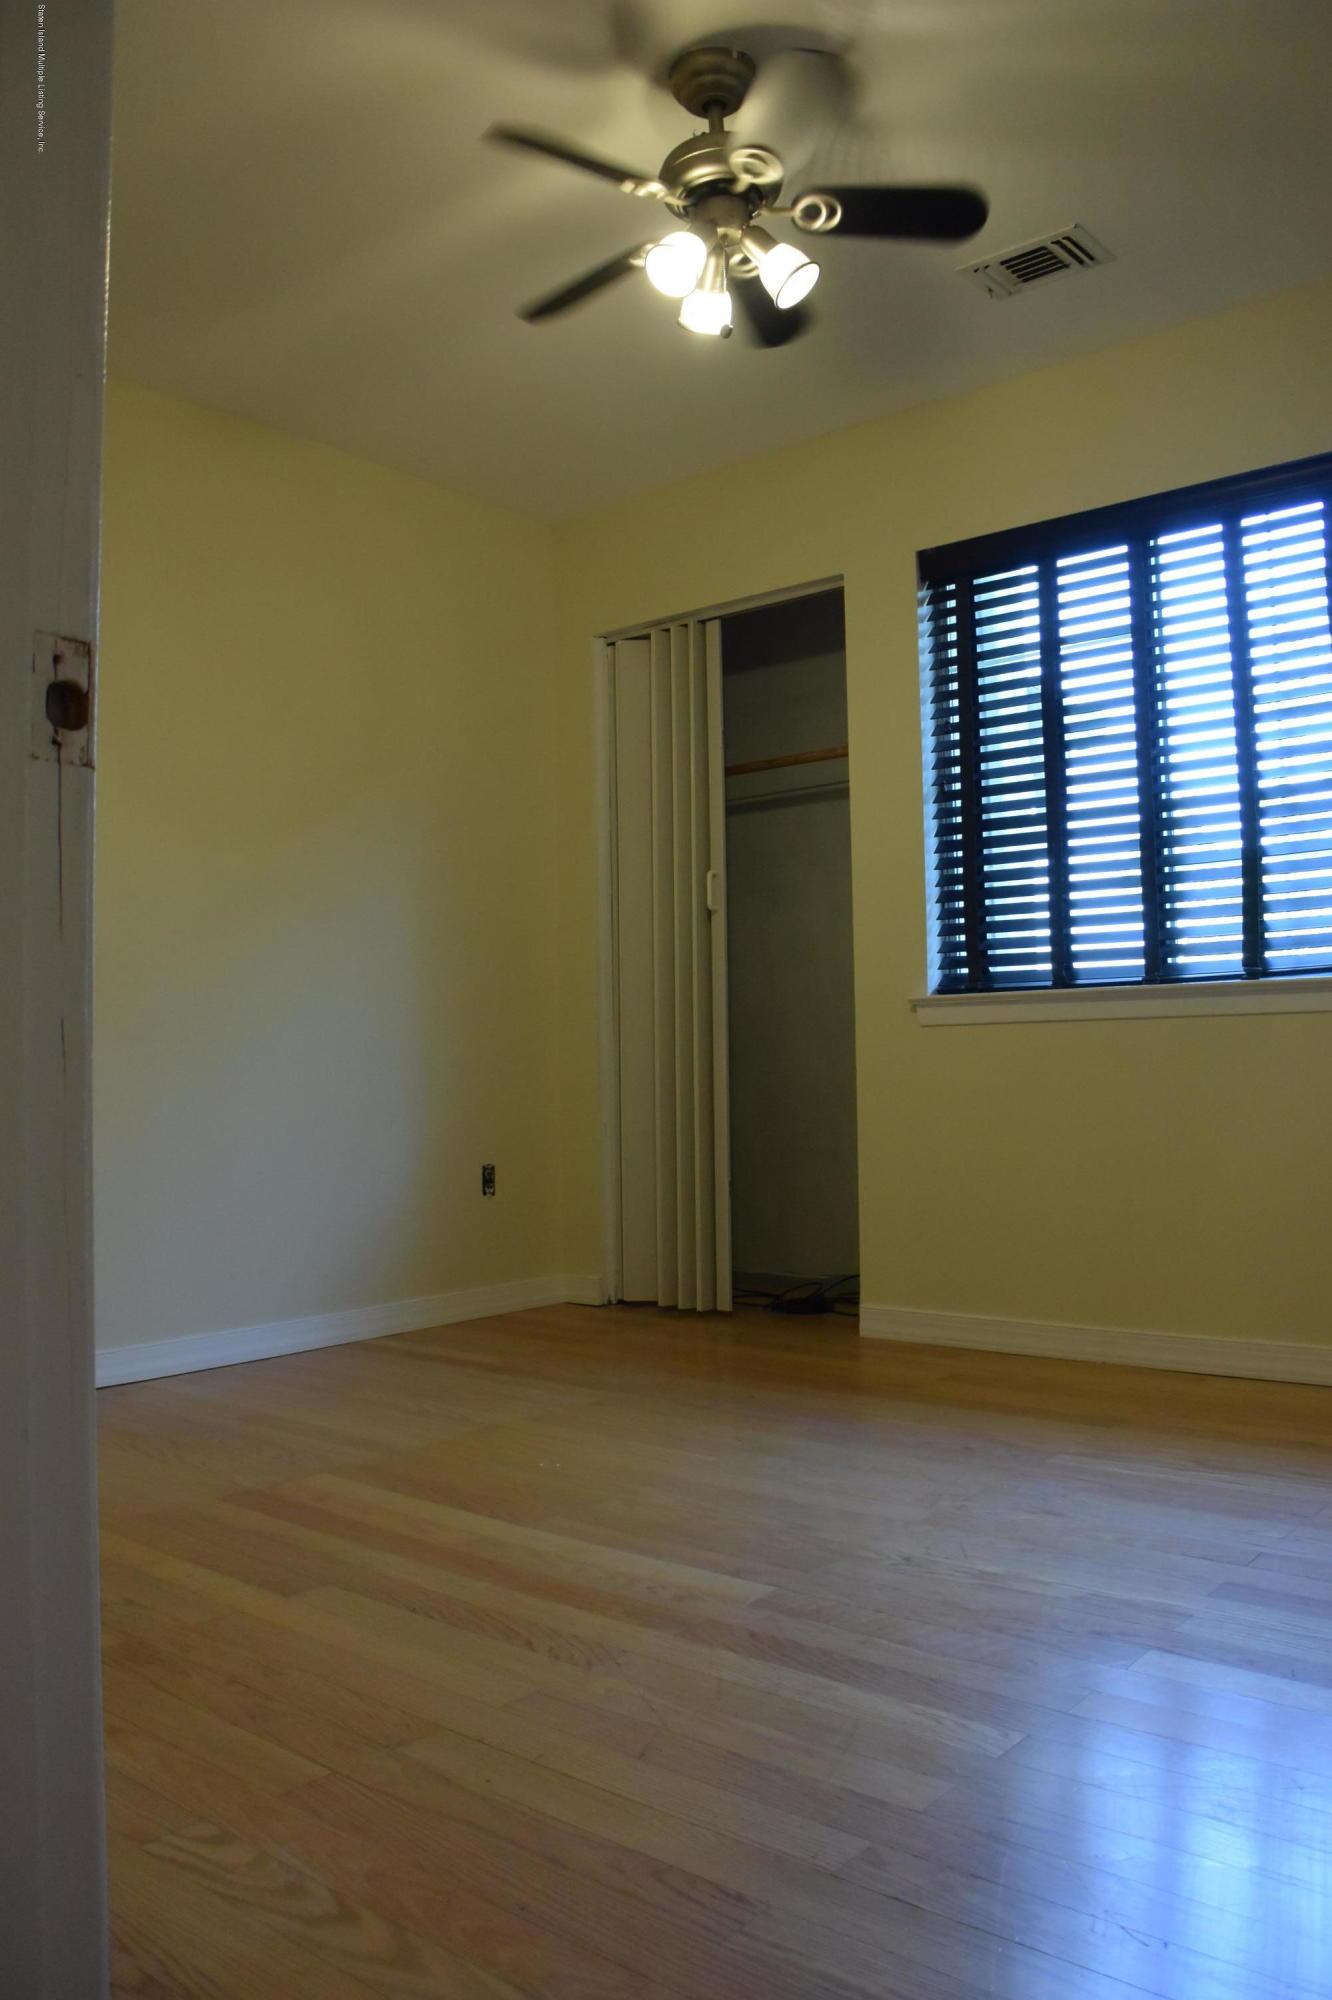 631 Correll Avenue,Staten Island,New York,10309,United States,2 Bedrooms Bedrooms,4 Rooms Rooms,2 BathroomsBathrooms,Res-Rental,Correll,1130591